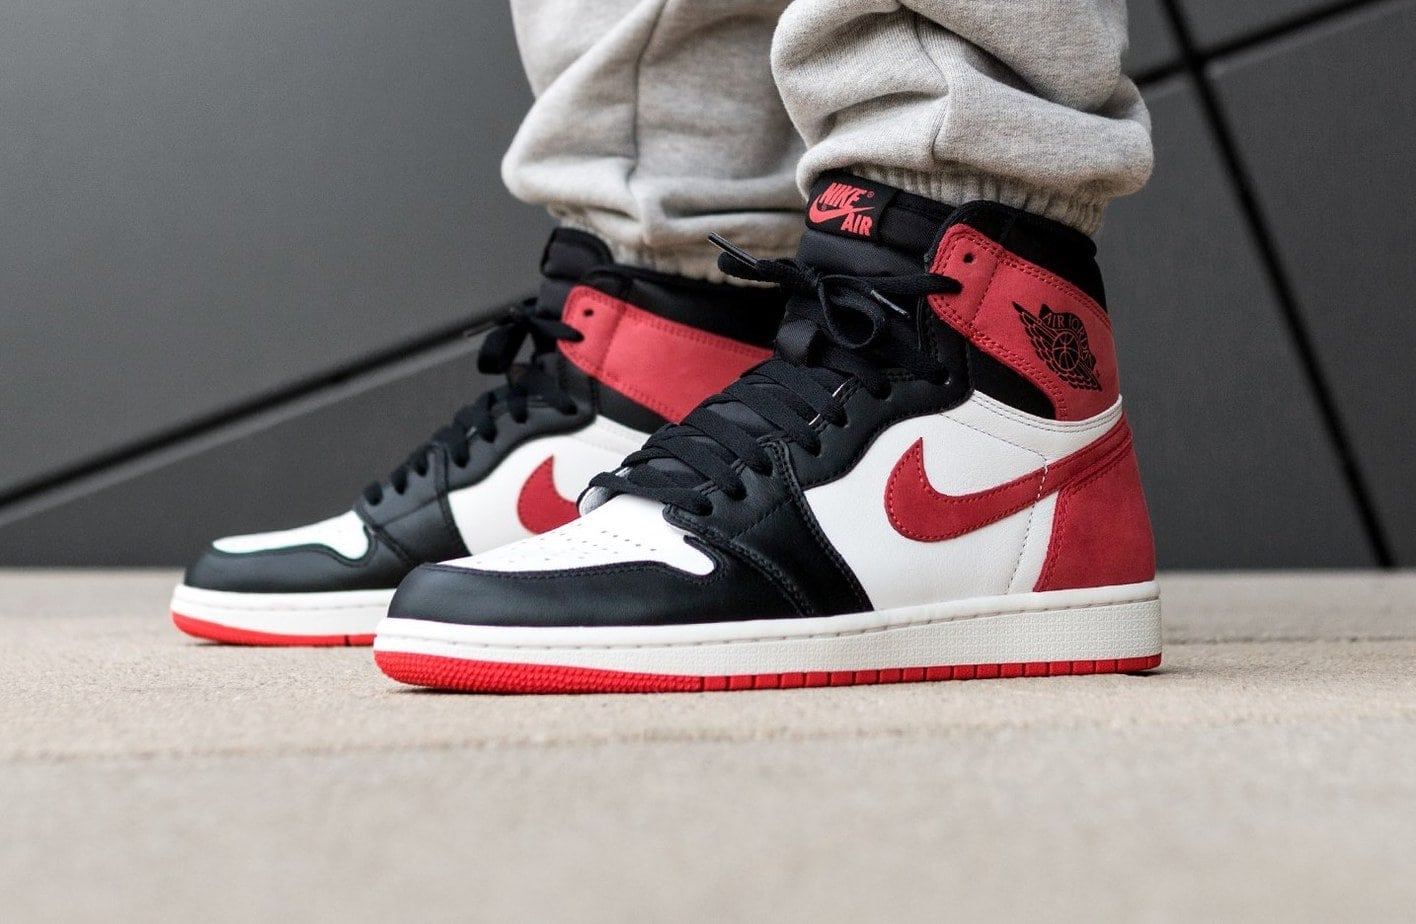 683f22eae1ff92 Air Jordan 1 Retro High OG